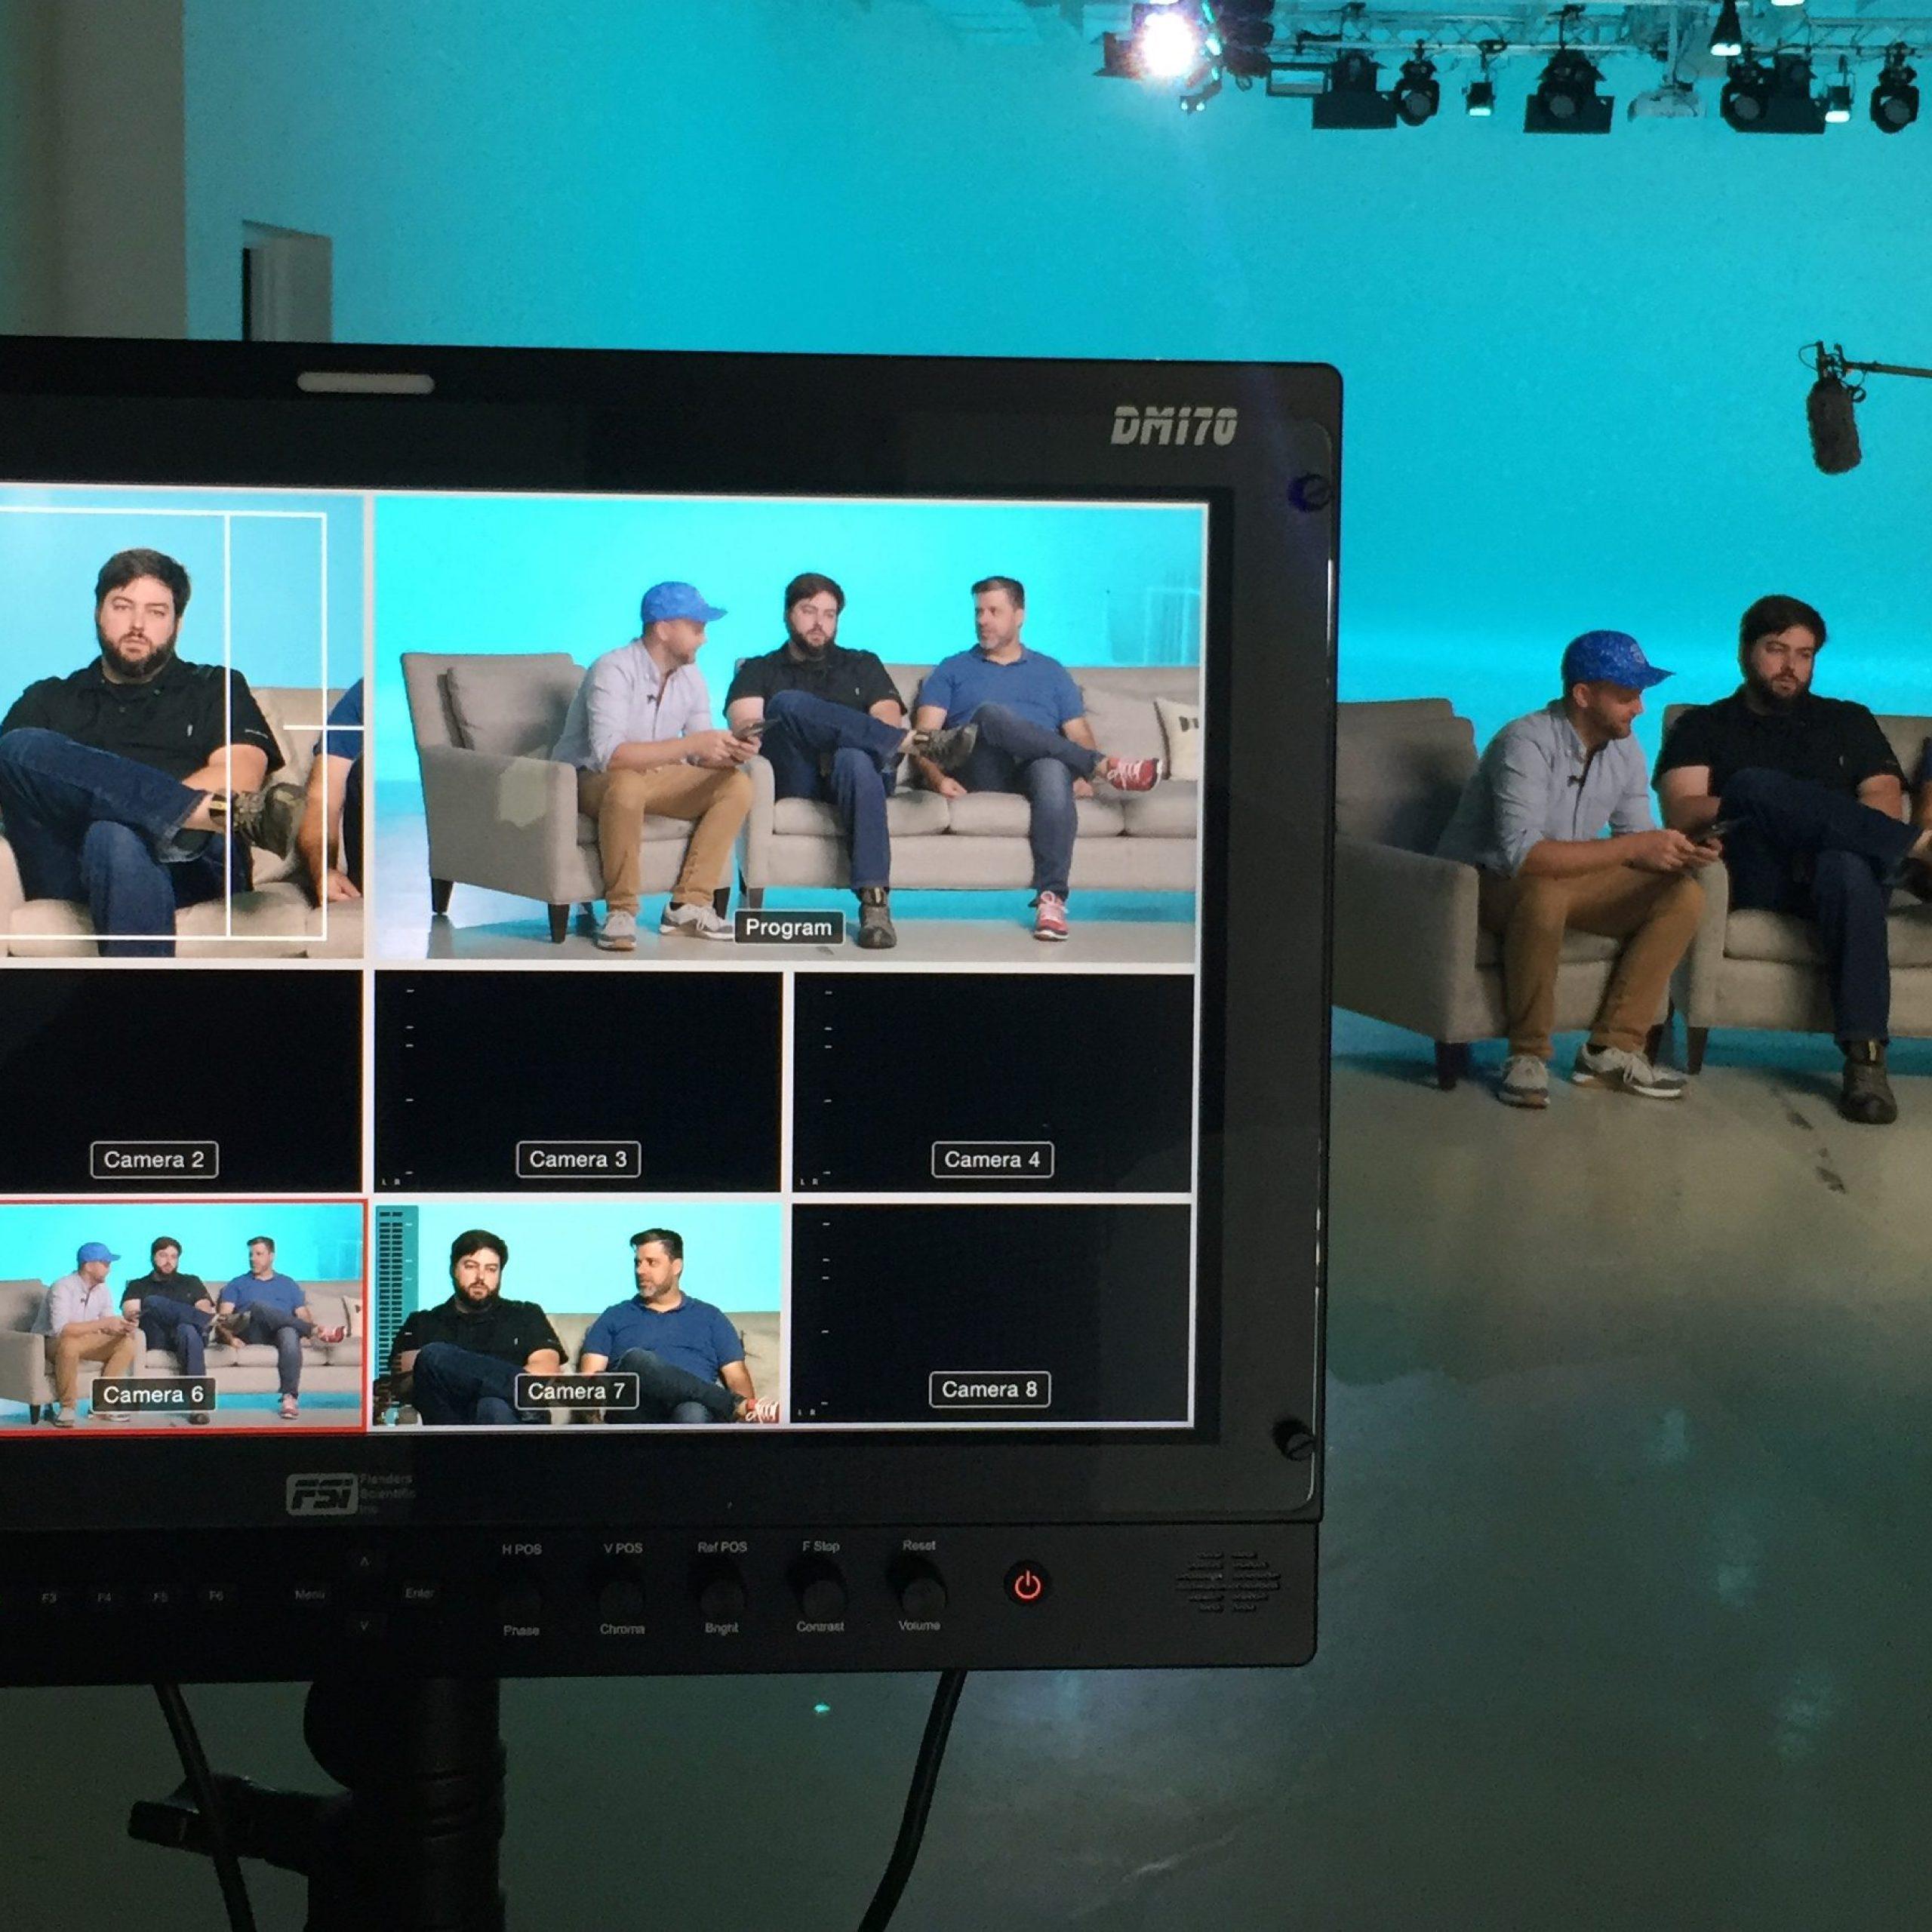 Blackmagic S Atem Television Studio Pro Hd Review